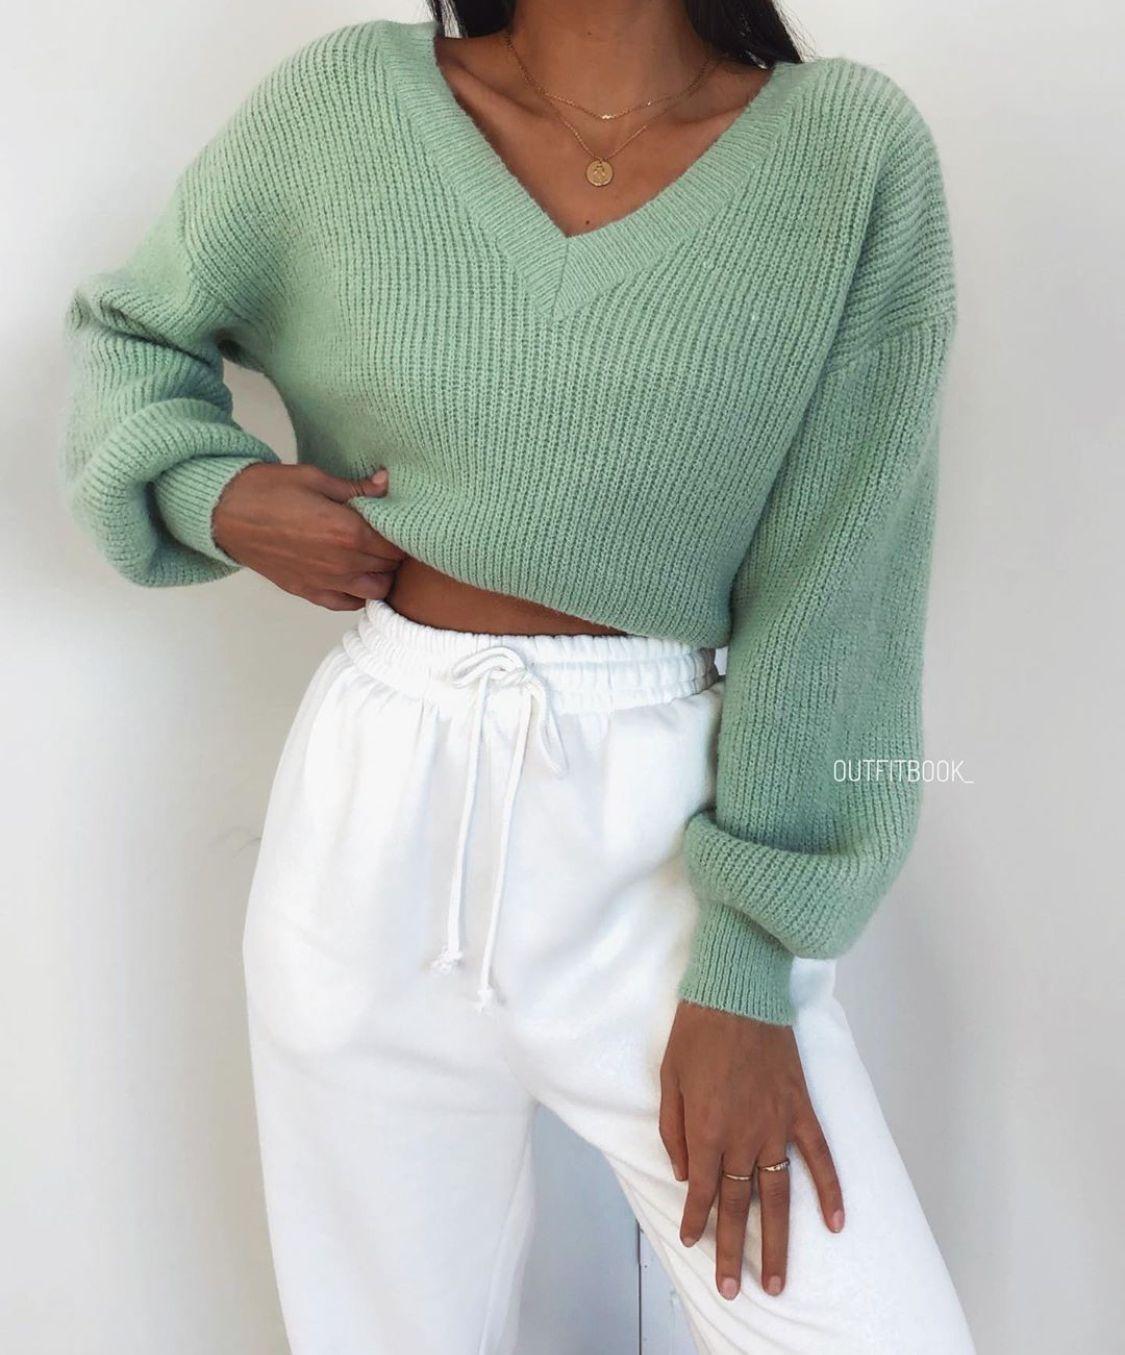 Das aktuellste Snap Shots Outfitbook #clothingideas Beliebt An heißen Sommertagen ...